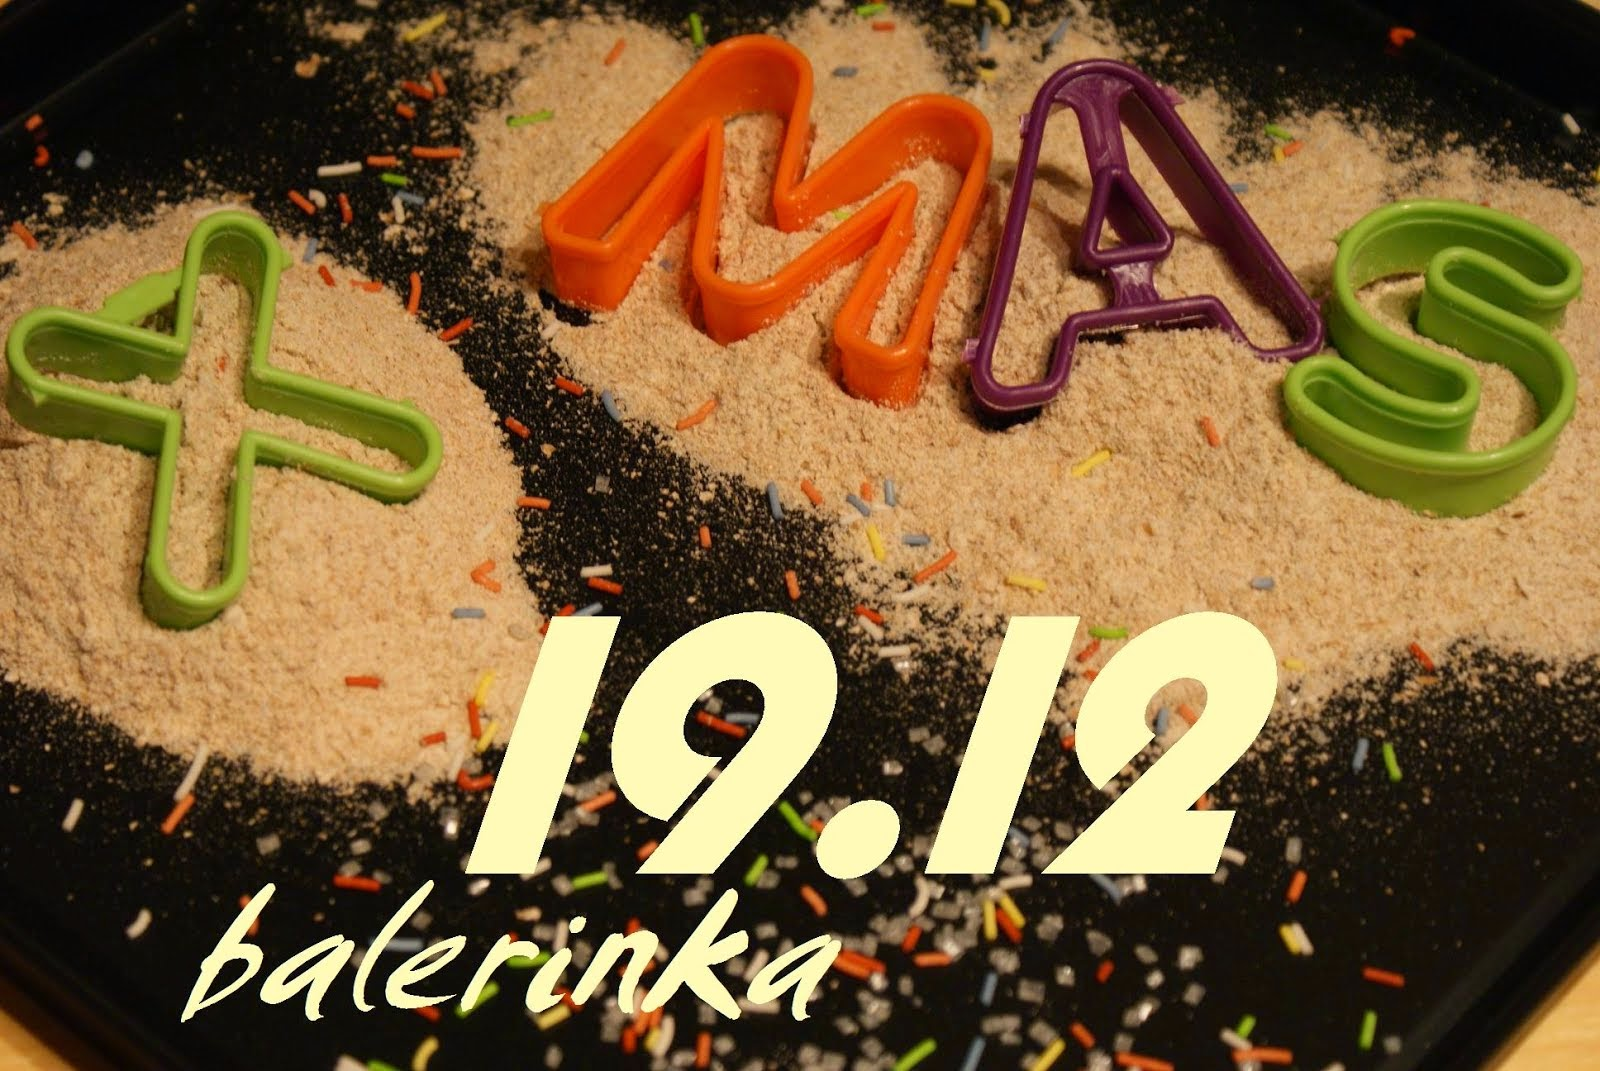 X - MAS  i  TASZKA  ;))